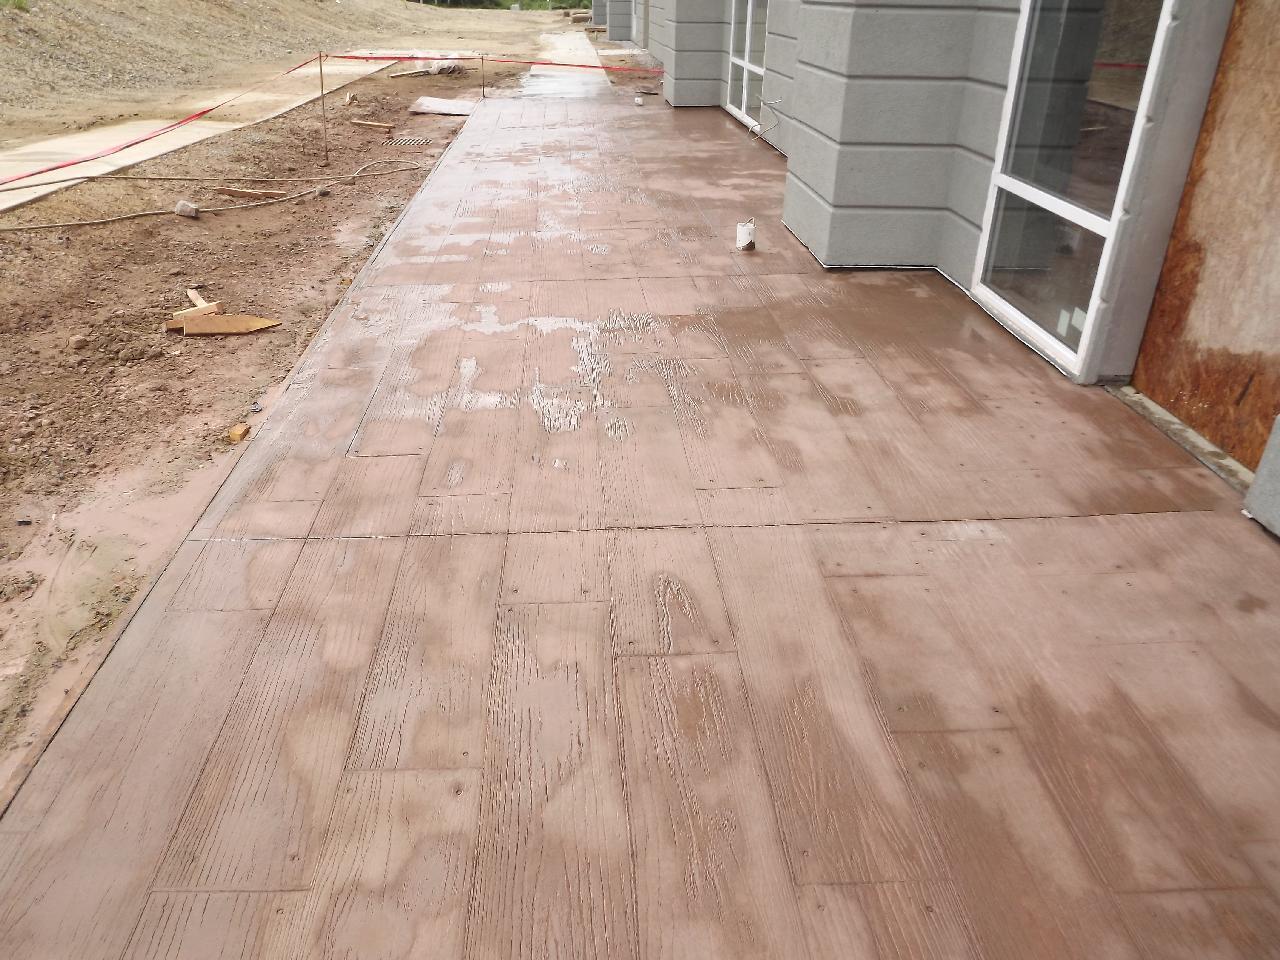 Wood Plank Stamped Concrete : Atlantic coast concrete hampton inn greensboro wood plank